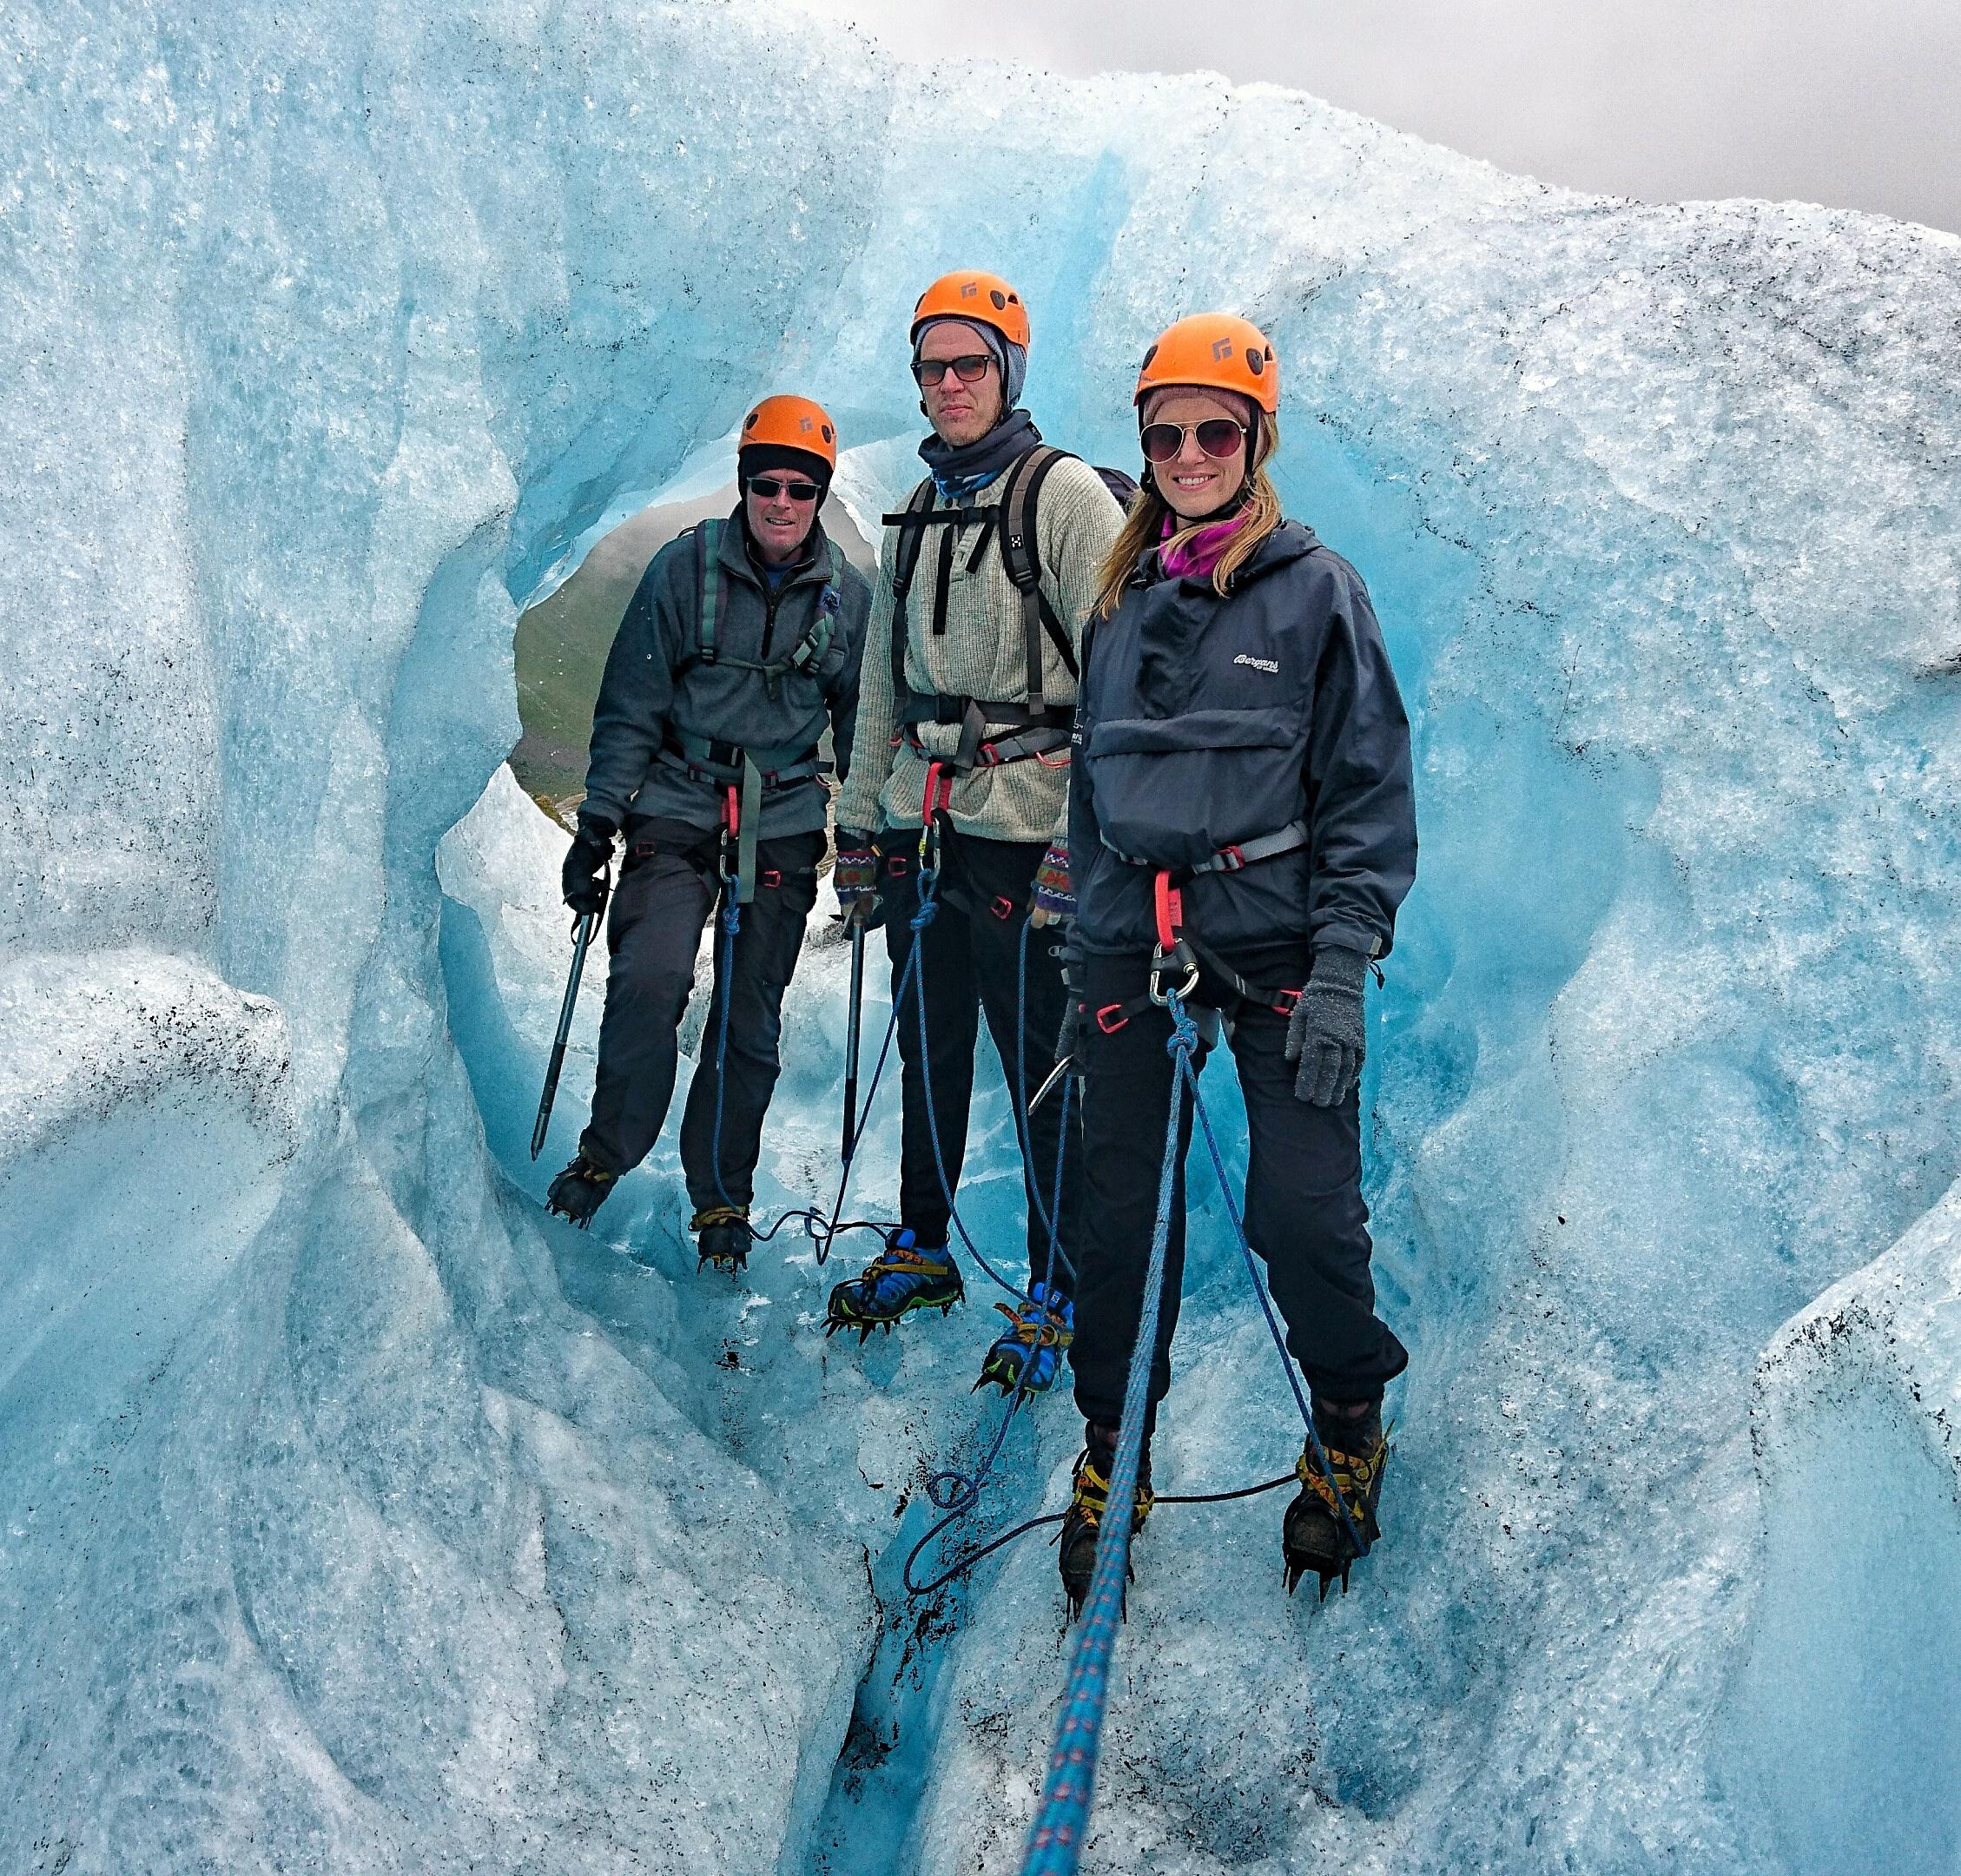 Price 900,- NOK - (minimum 4 people or minimum price 3400,-Included: Glacier equipment (crampons, ice axe, helmet, harness, carabiners, rope)